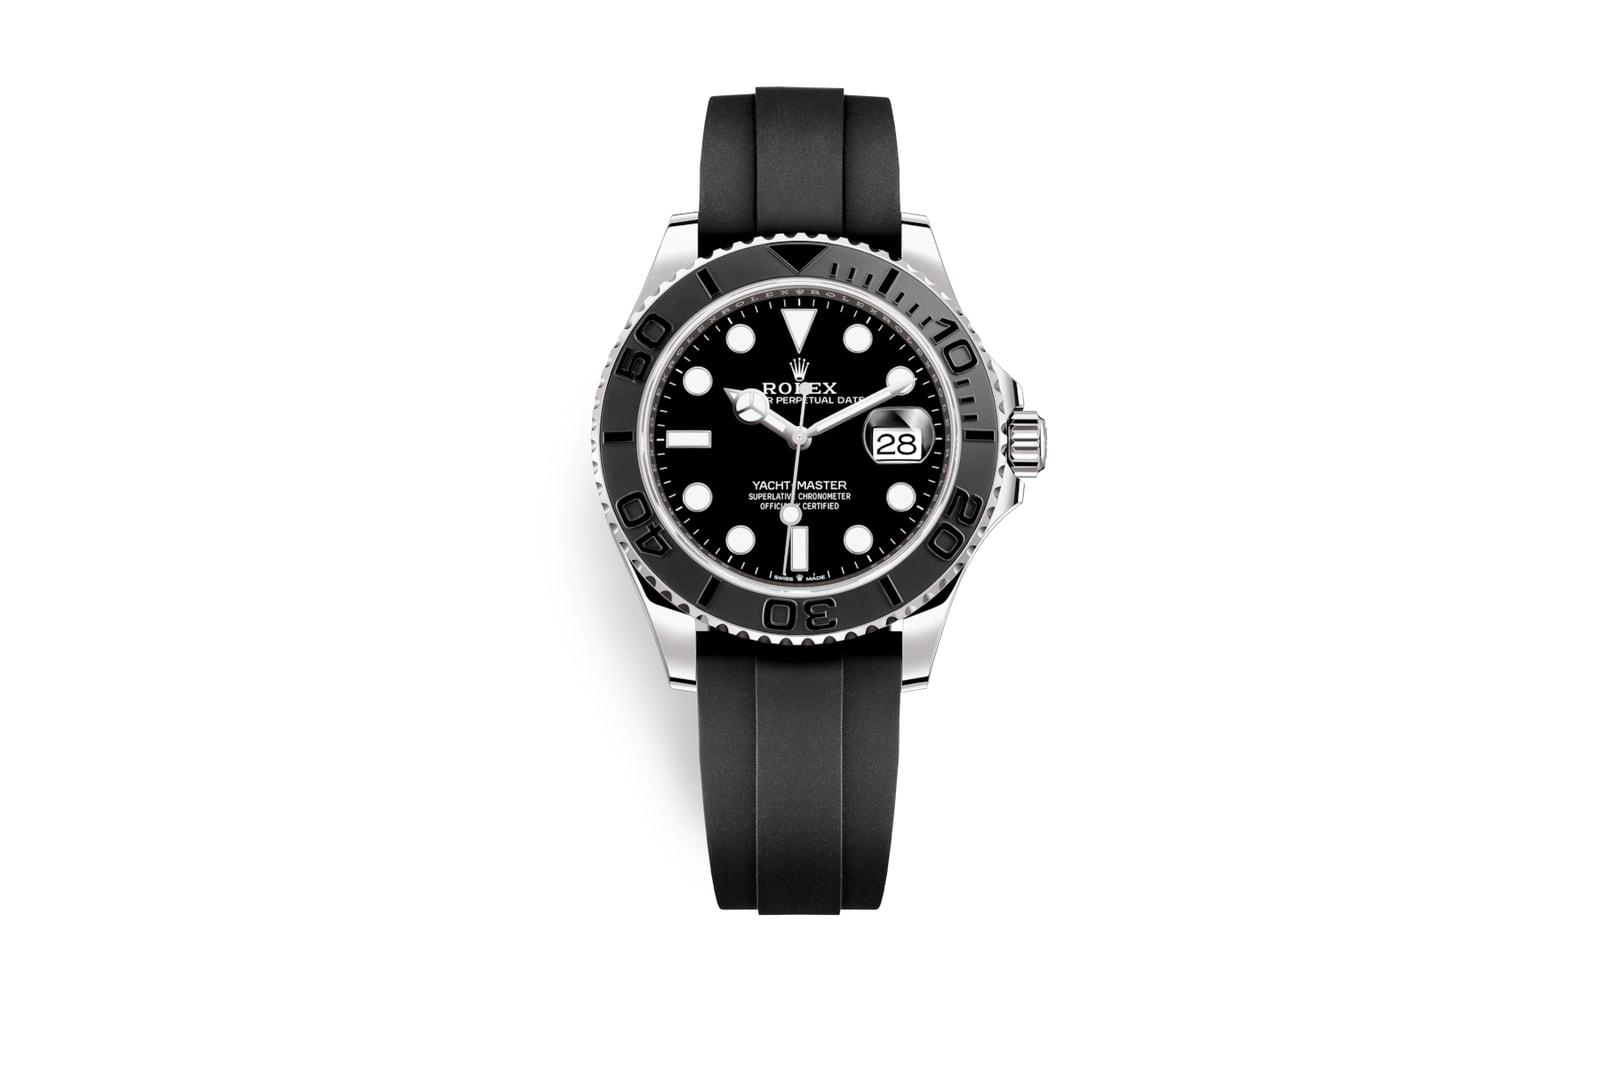 Baselworld 2019 回顧:重點全新錶款一覽